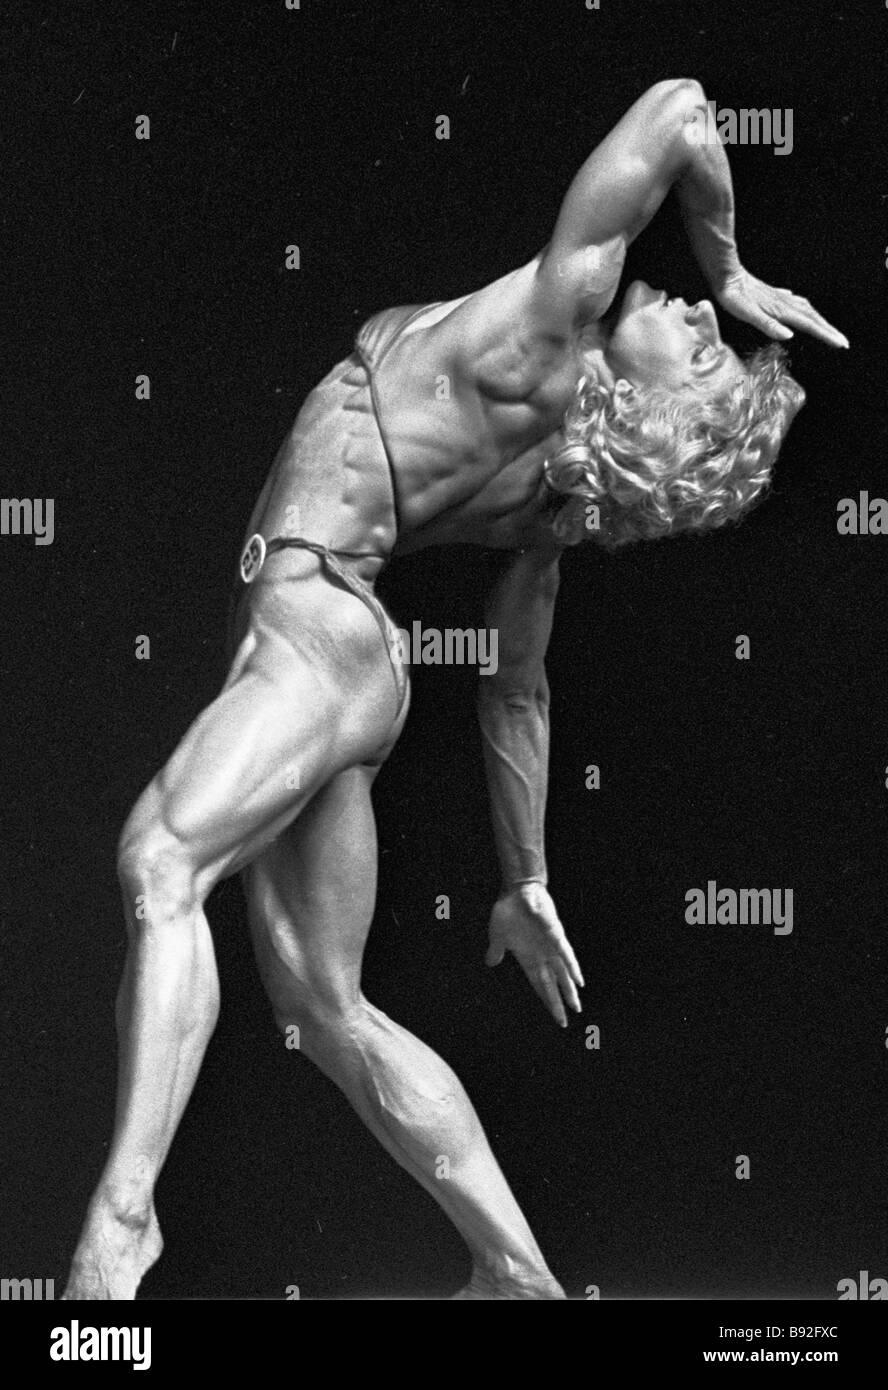 European champion under 57 kg Vetina Kliber at the European bodybuilding championship - Stock Image